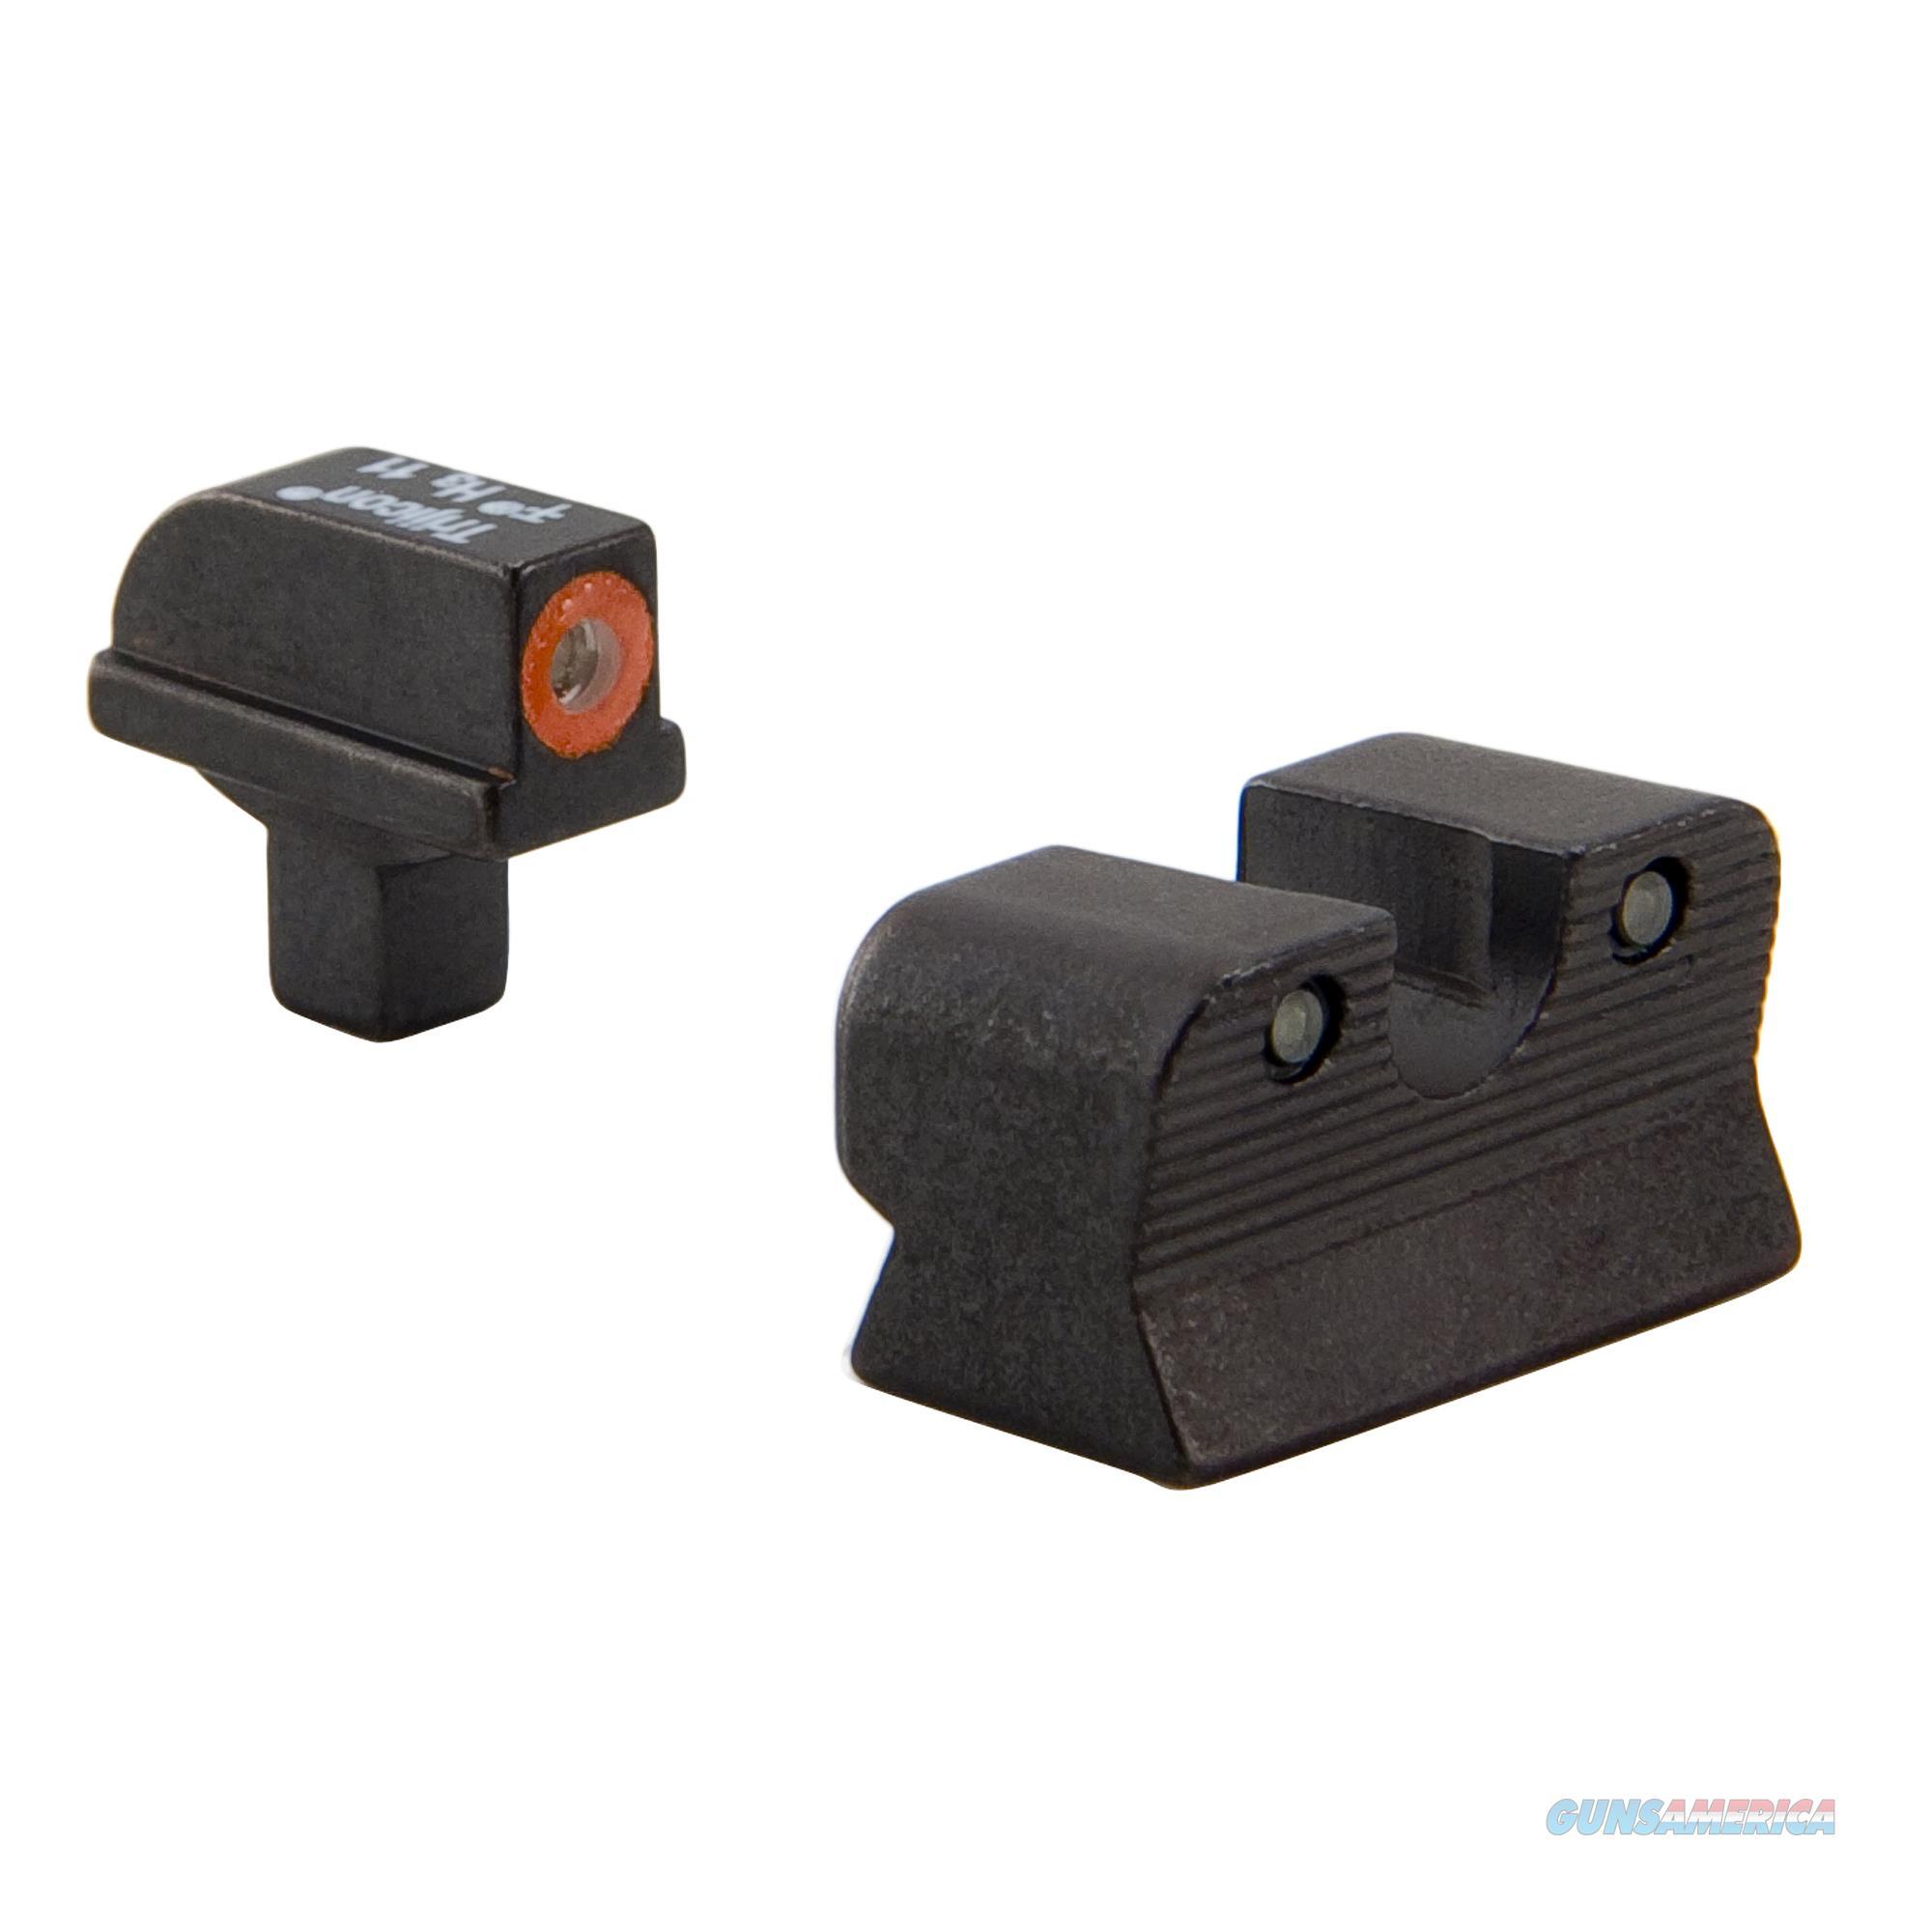 Trijicon Colt Hd Night Sight Set CA110-C-600817  Non-Guns > Iron/Metal/Peep Sights